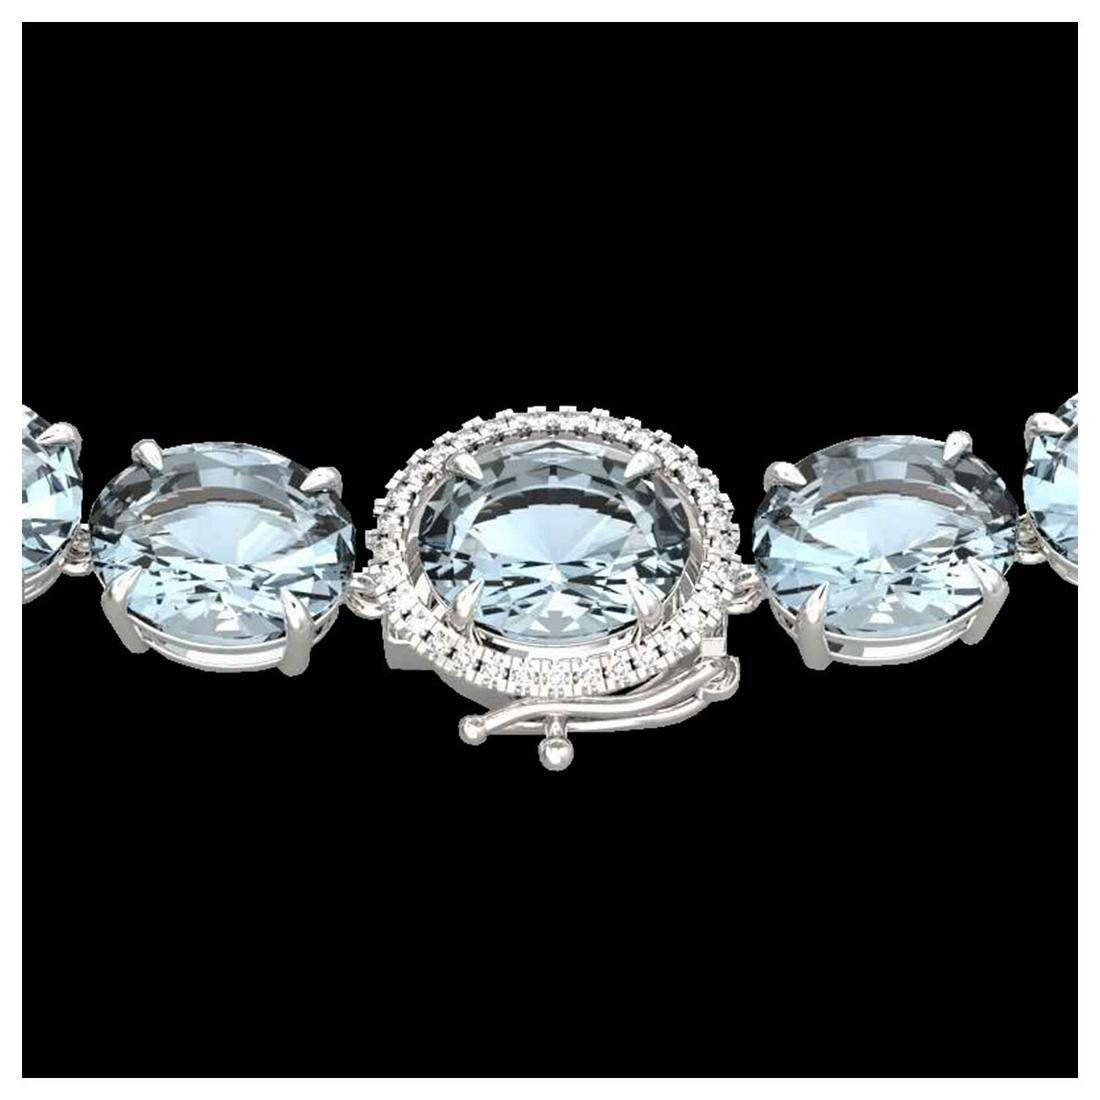 177 ctw Sky Blue Topaz & Diamond Necklace 14K White